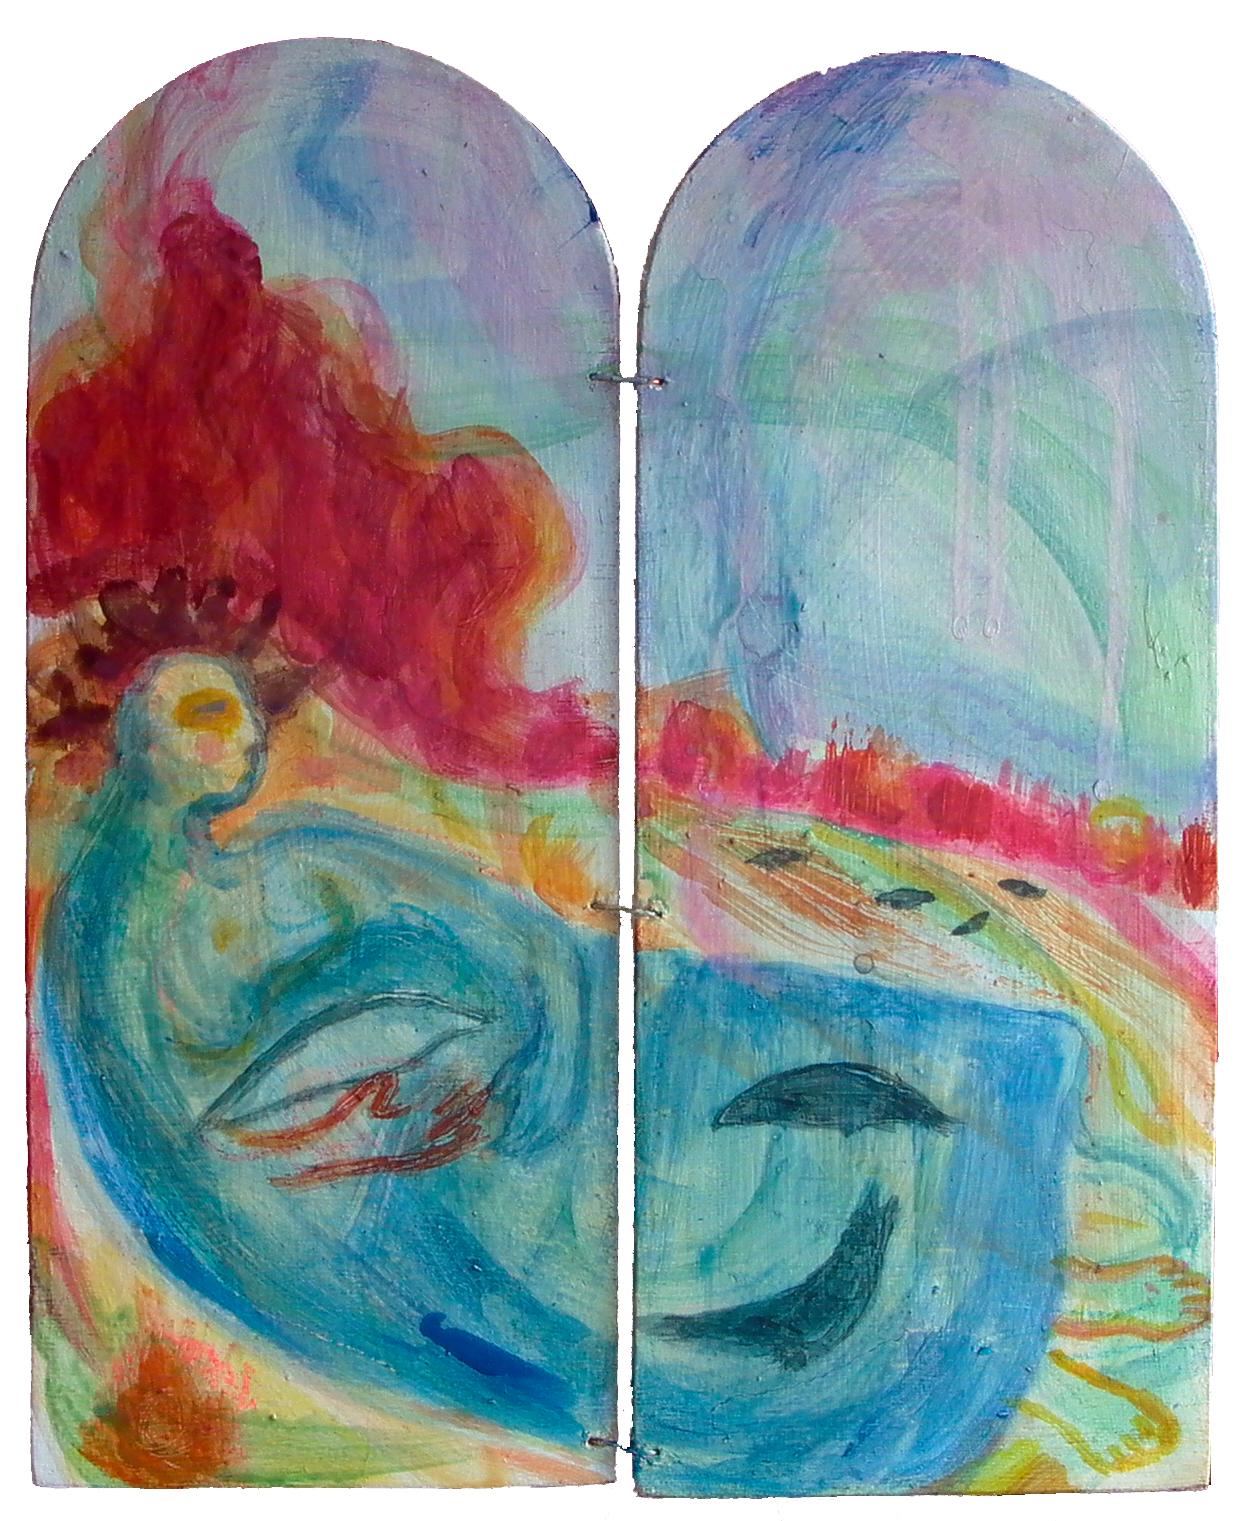 Diptych - Rook Robe - 2014 - Acrylic, Mixed Media on Board - 25 X 30 cm